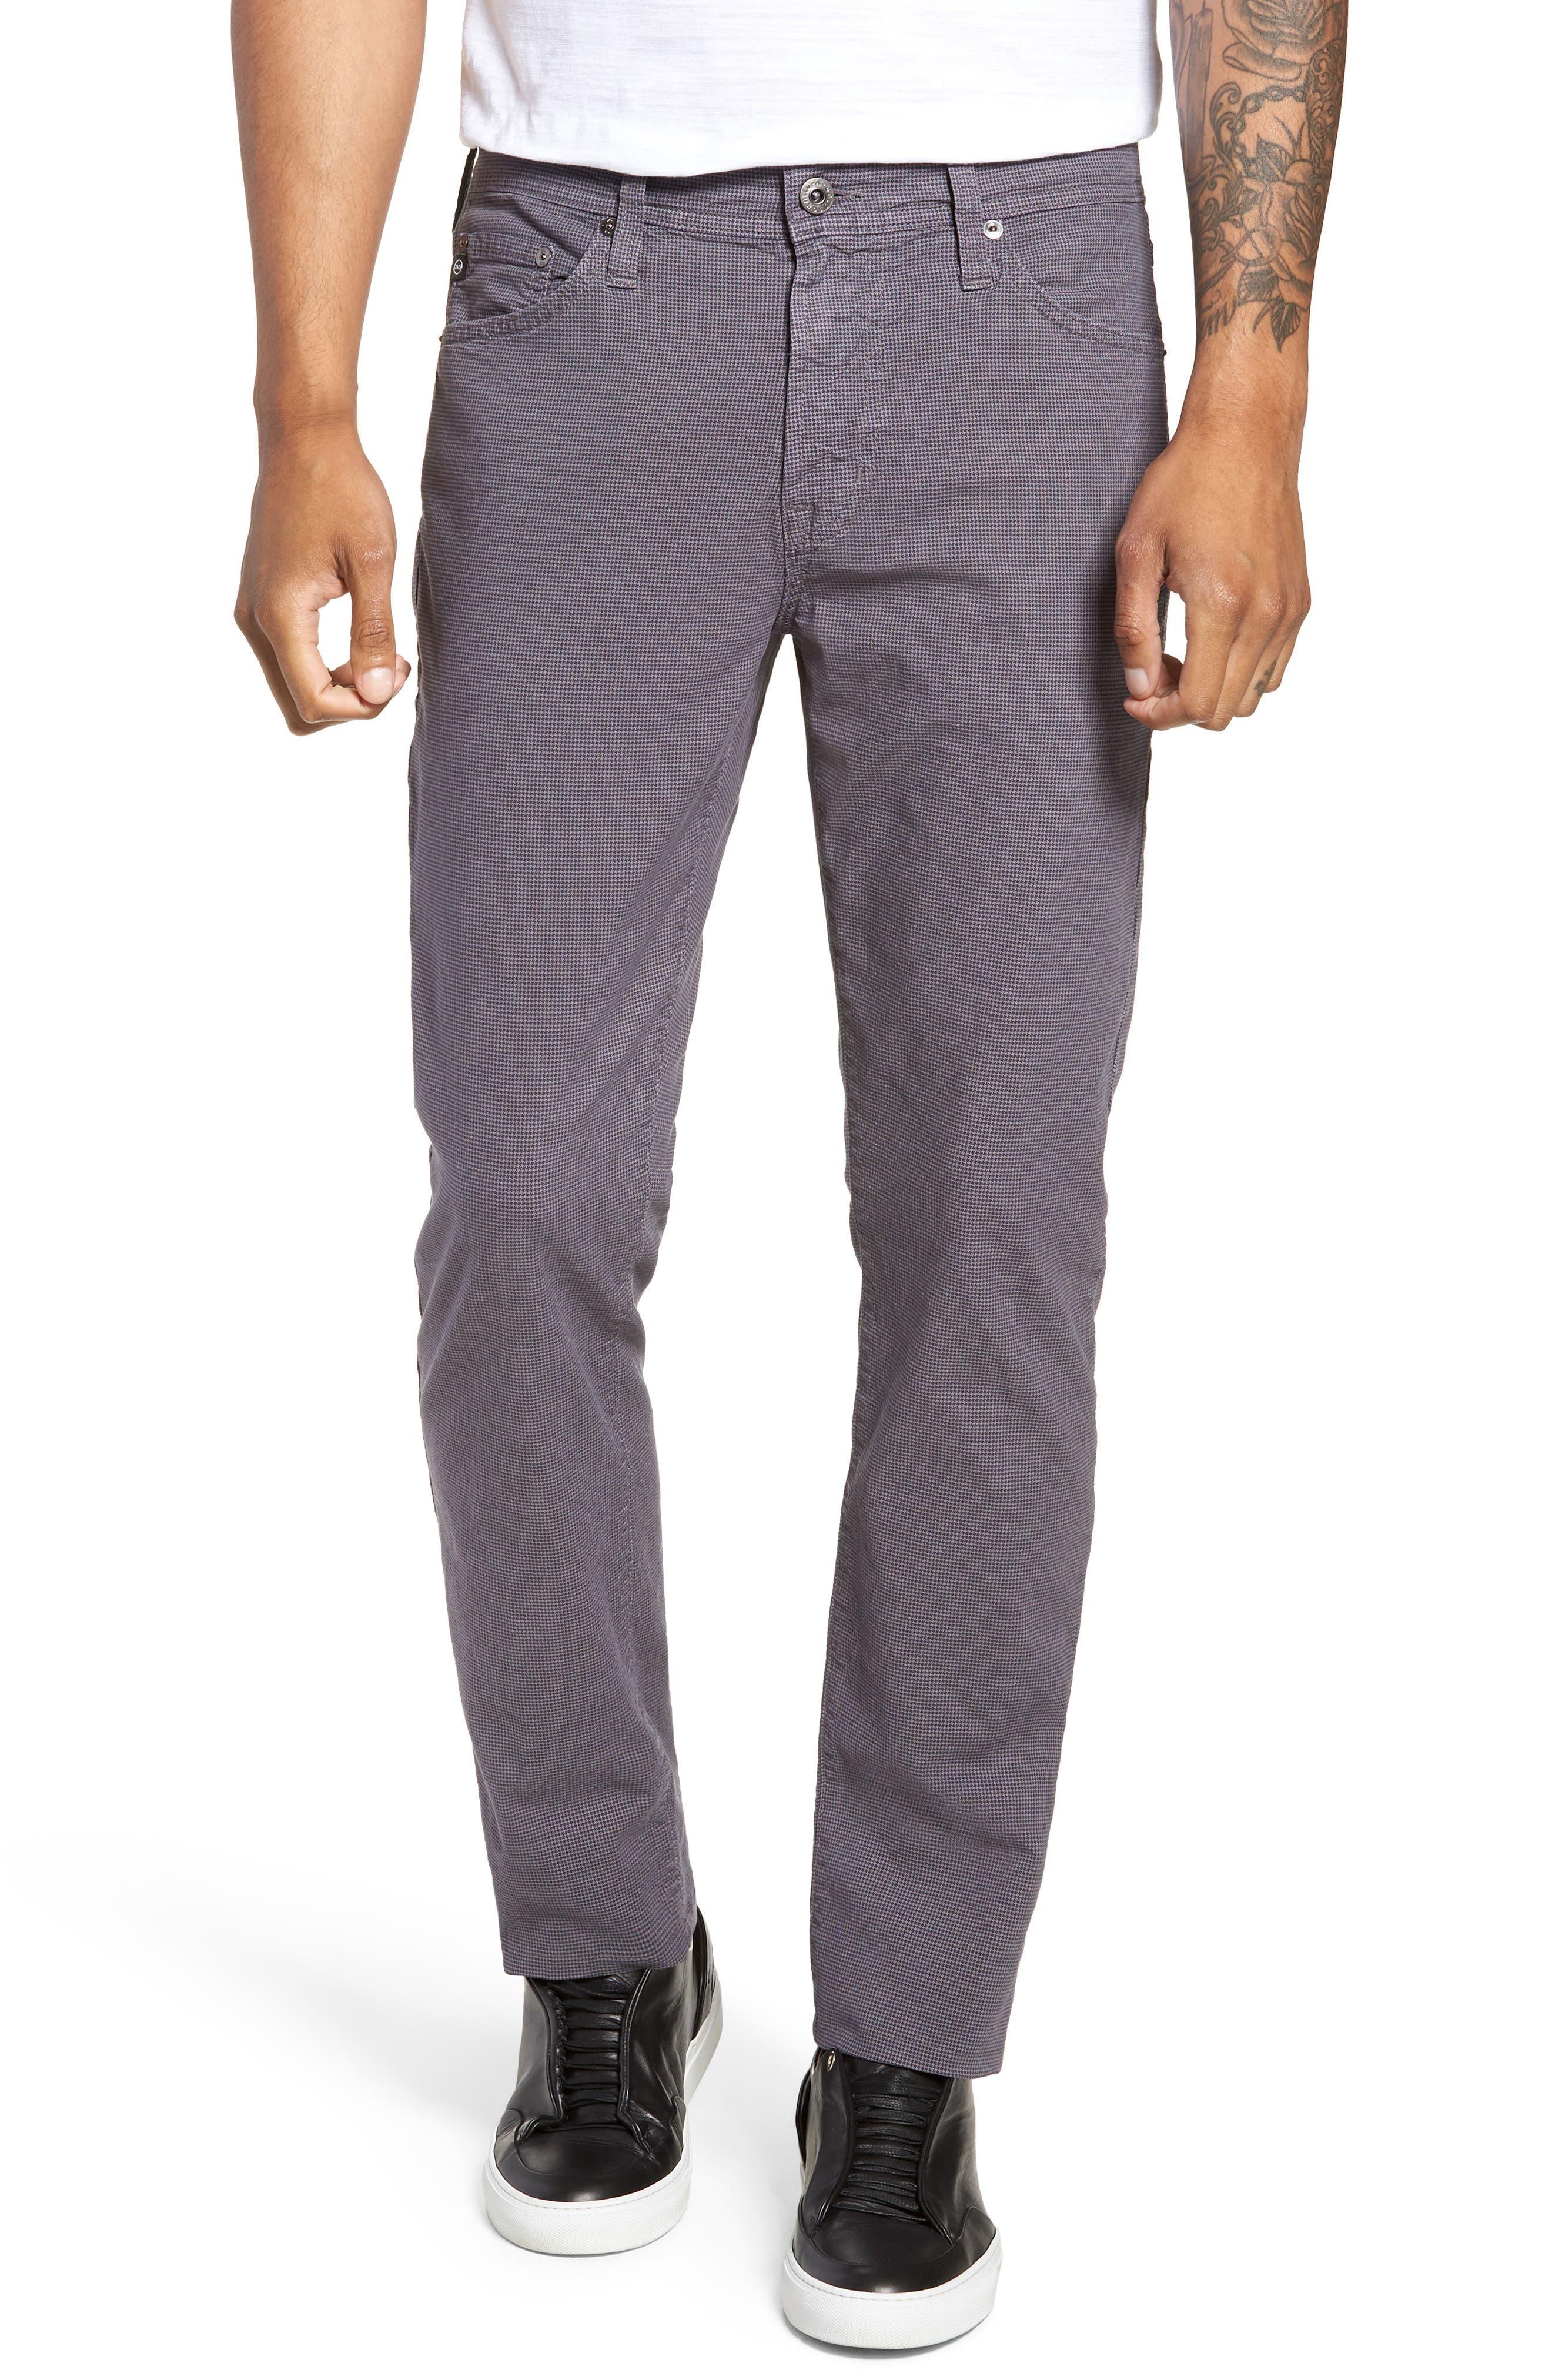 Everett Houndstooth Slim Fit Pants,                             Main thumbnail 1, color,                             AUTUMN FOG